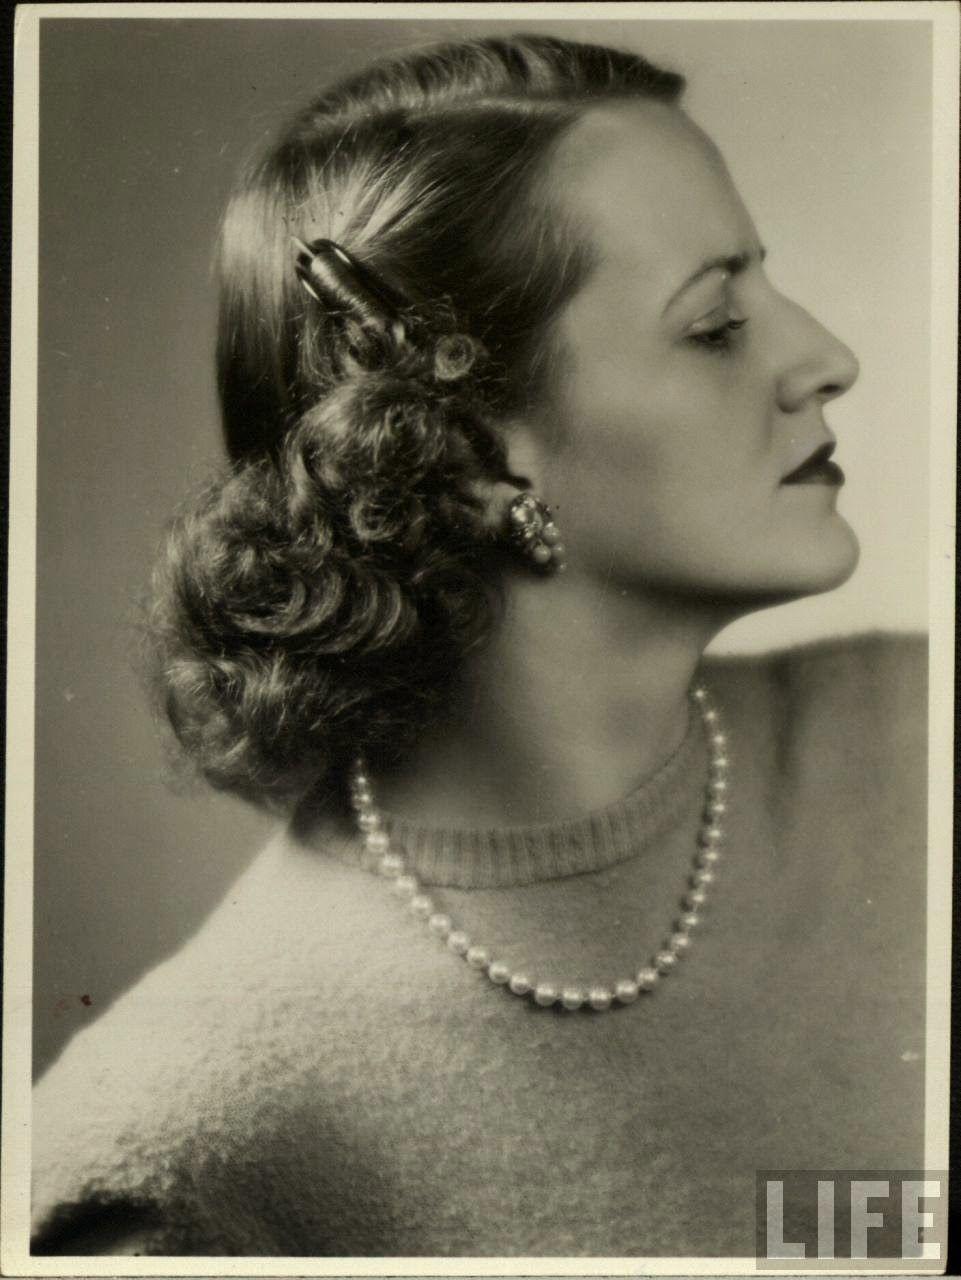 Bea Hair Women Beautiful Women S Hairstyles From The 1940s Vintage Hairstyles Retro Hairstyles 1940s Hairstyles